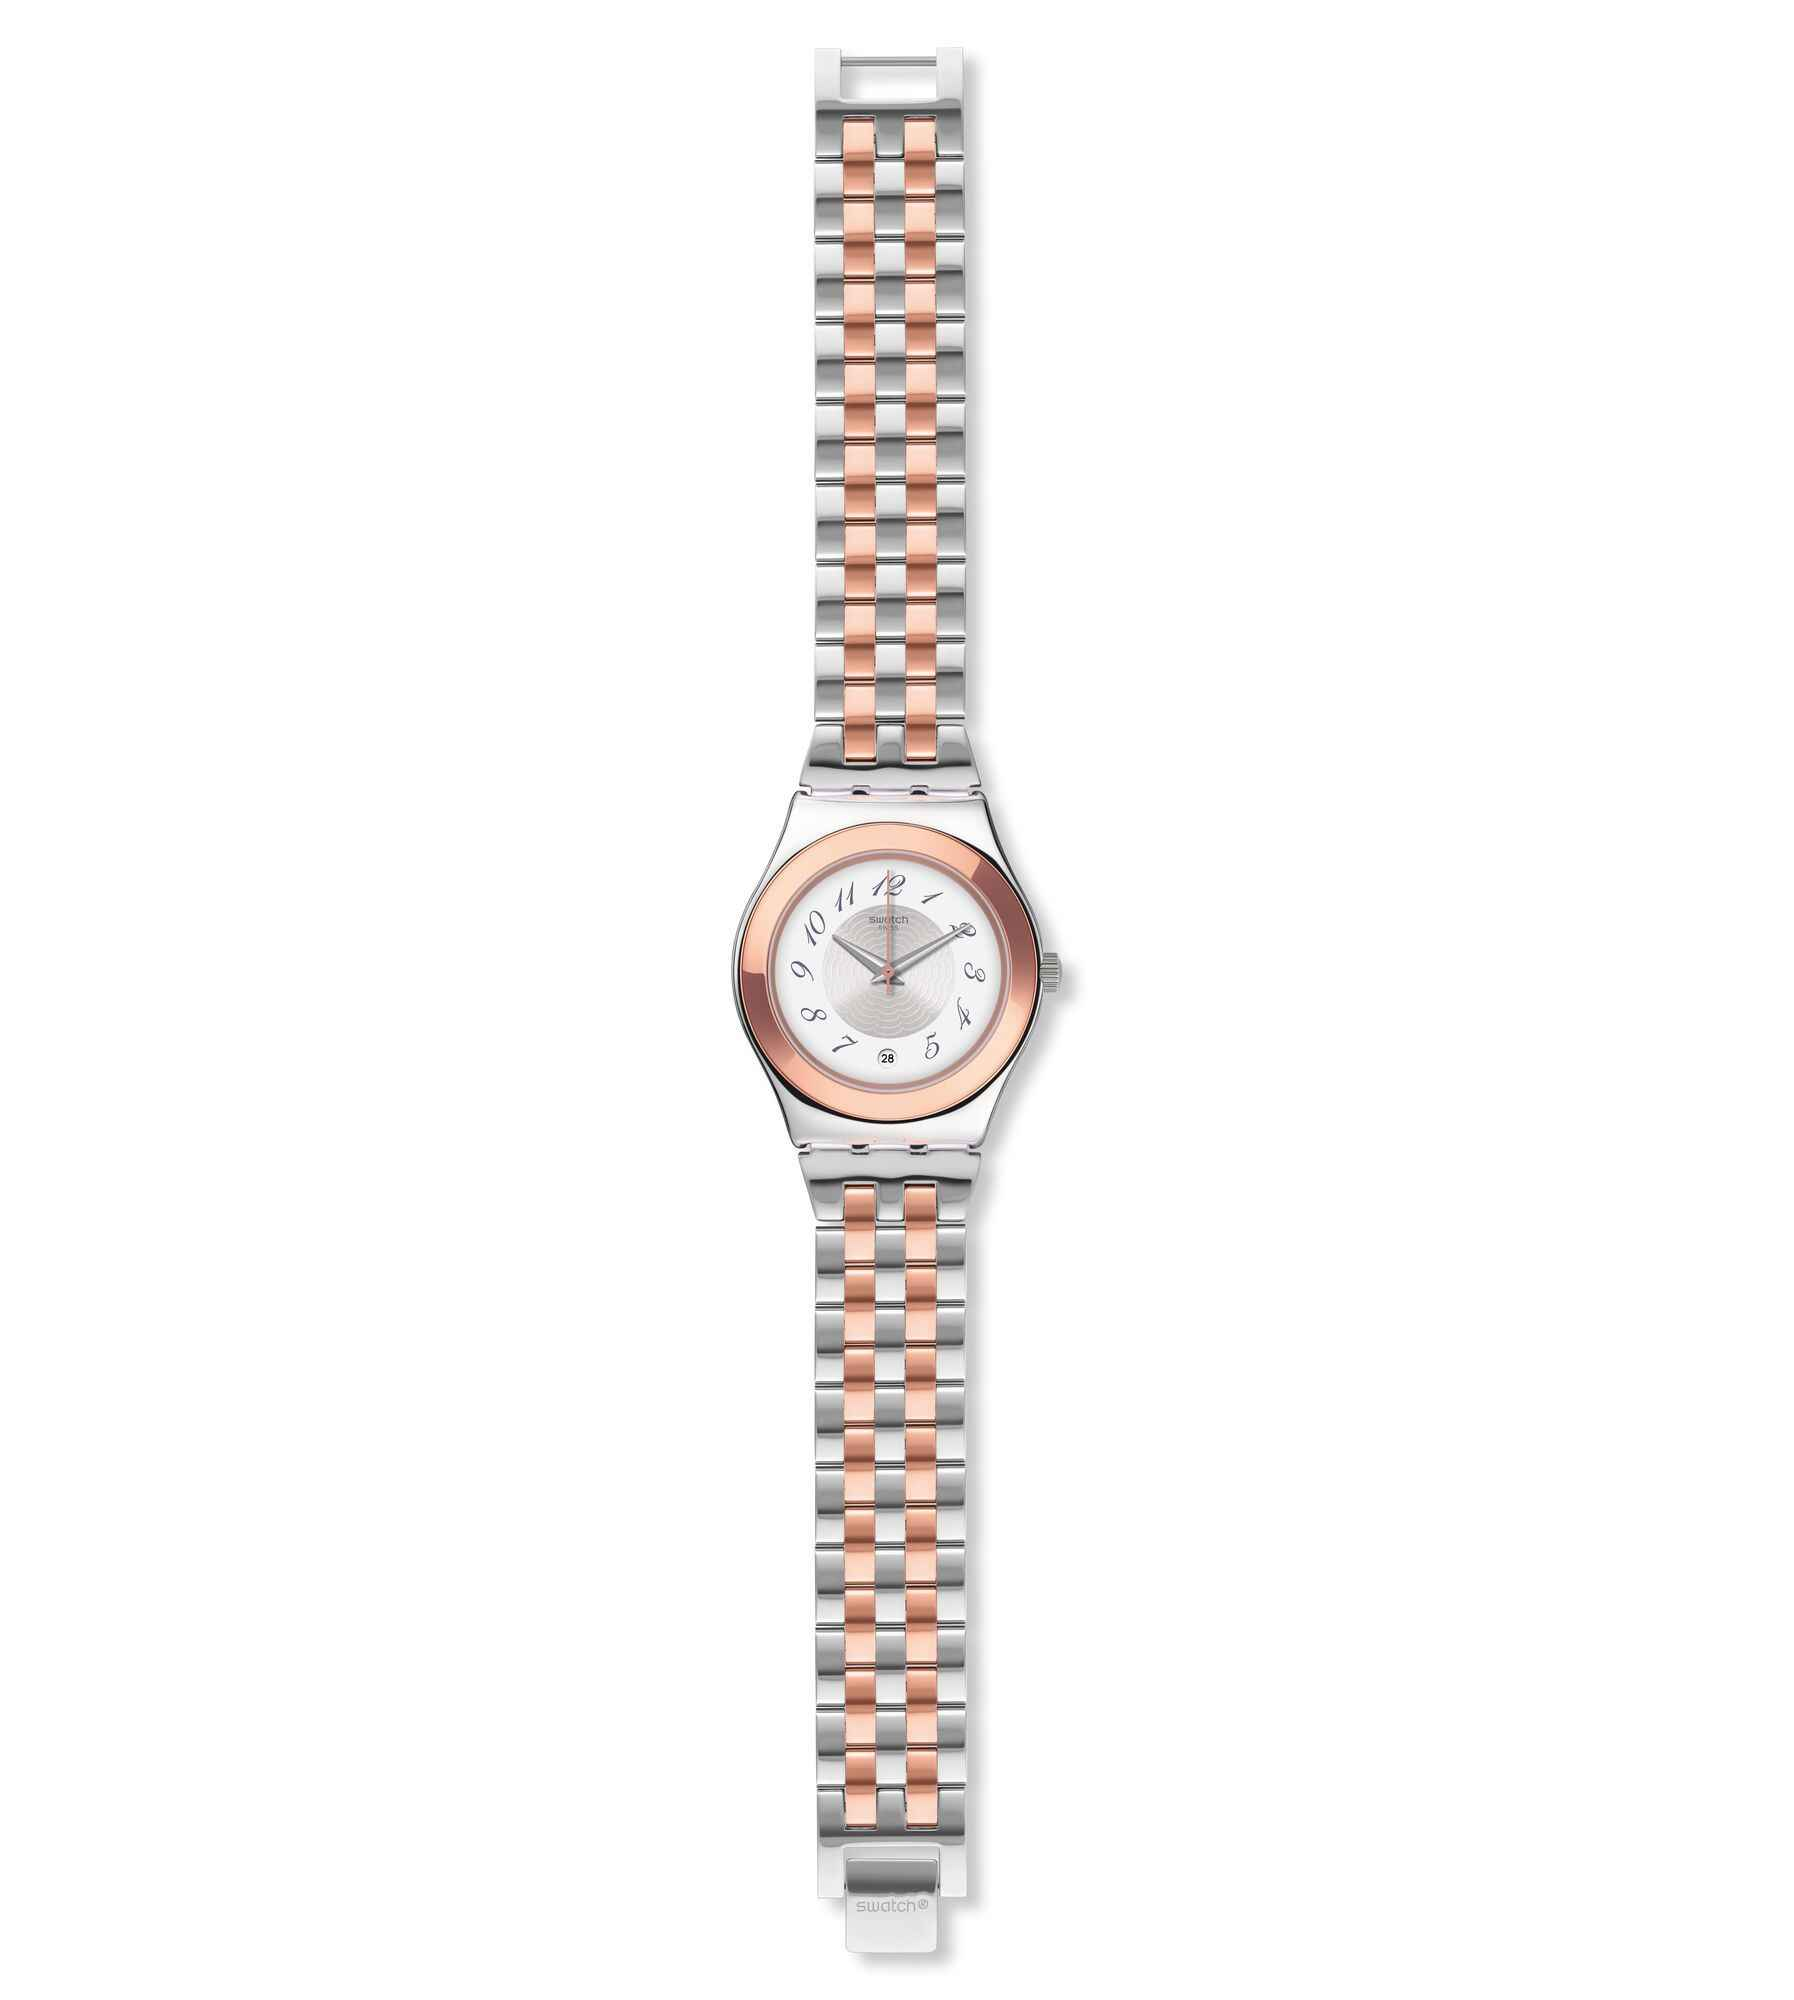 Armband Analog Edelstahl Quarz Yls454g Swatch Mit Damen Uhr g6fY7by